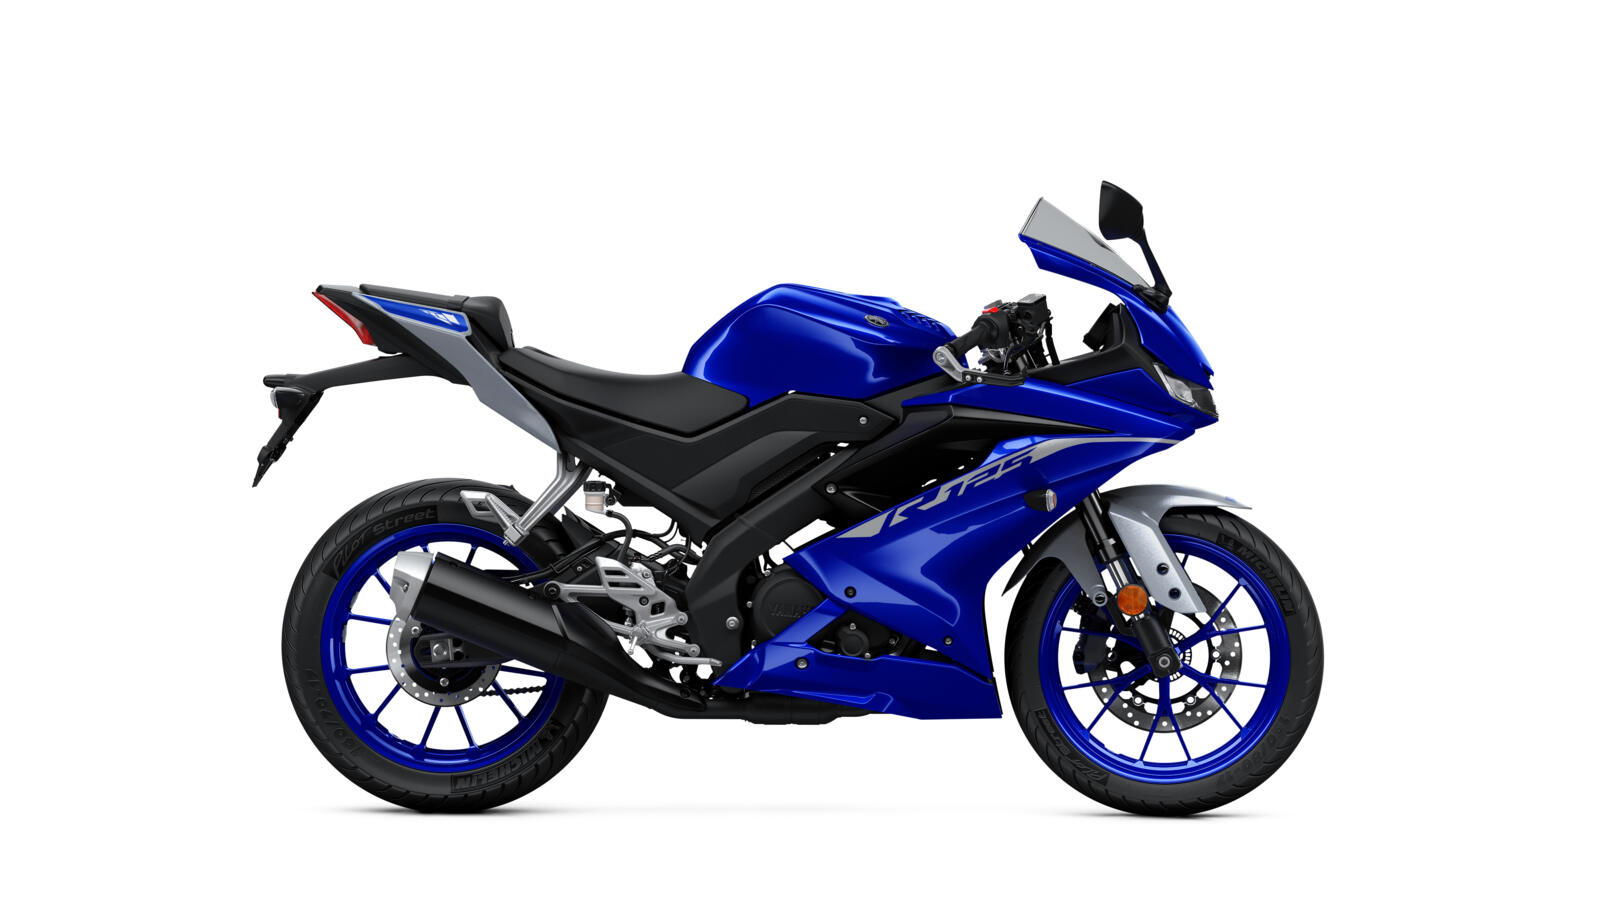 Yamaha YZF-R125 A1 motor